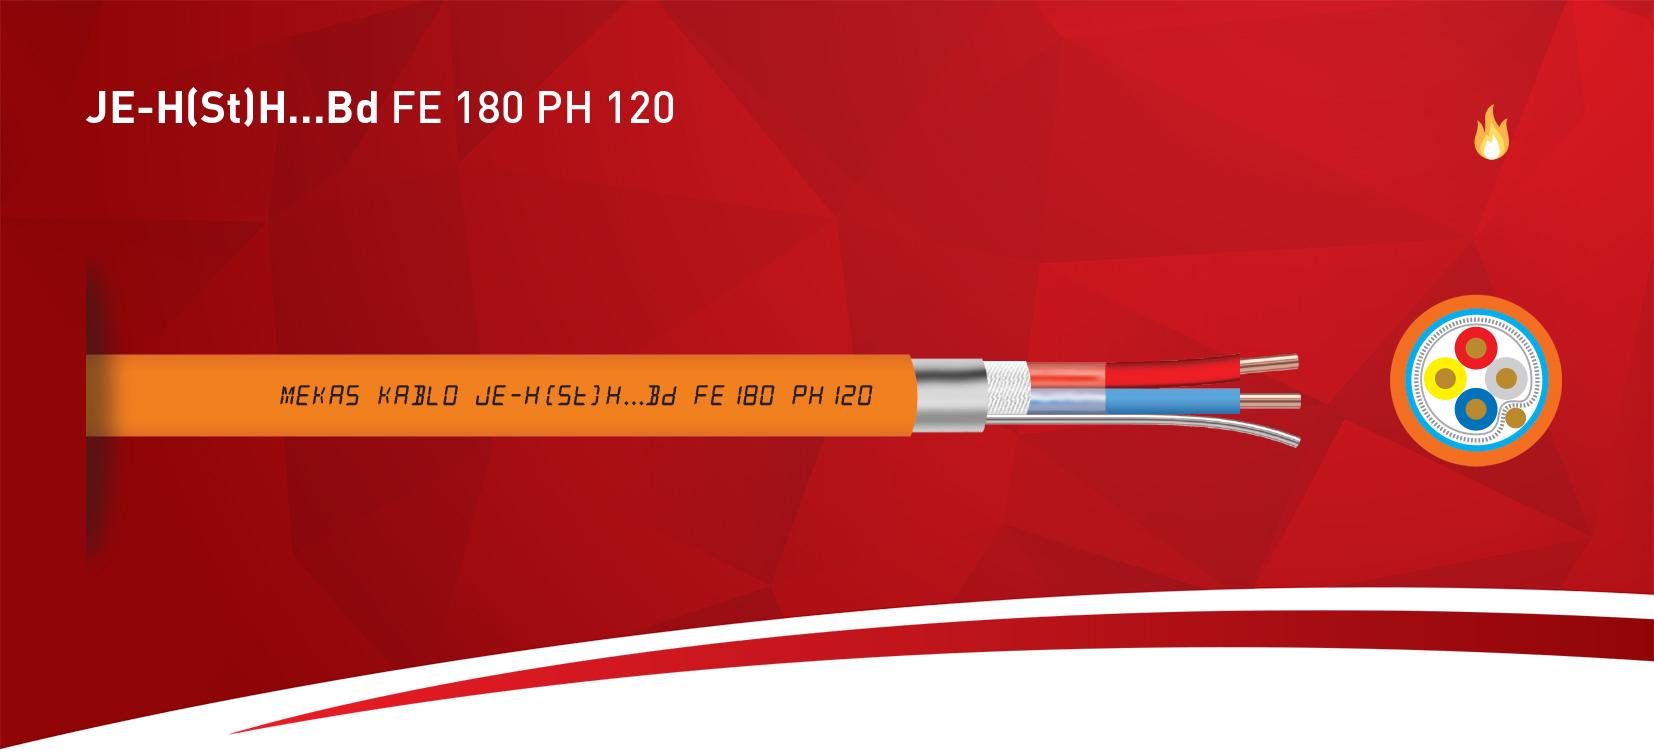 JE-HStH FE180 PH120